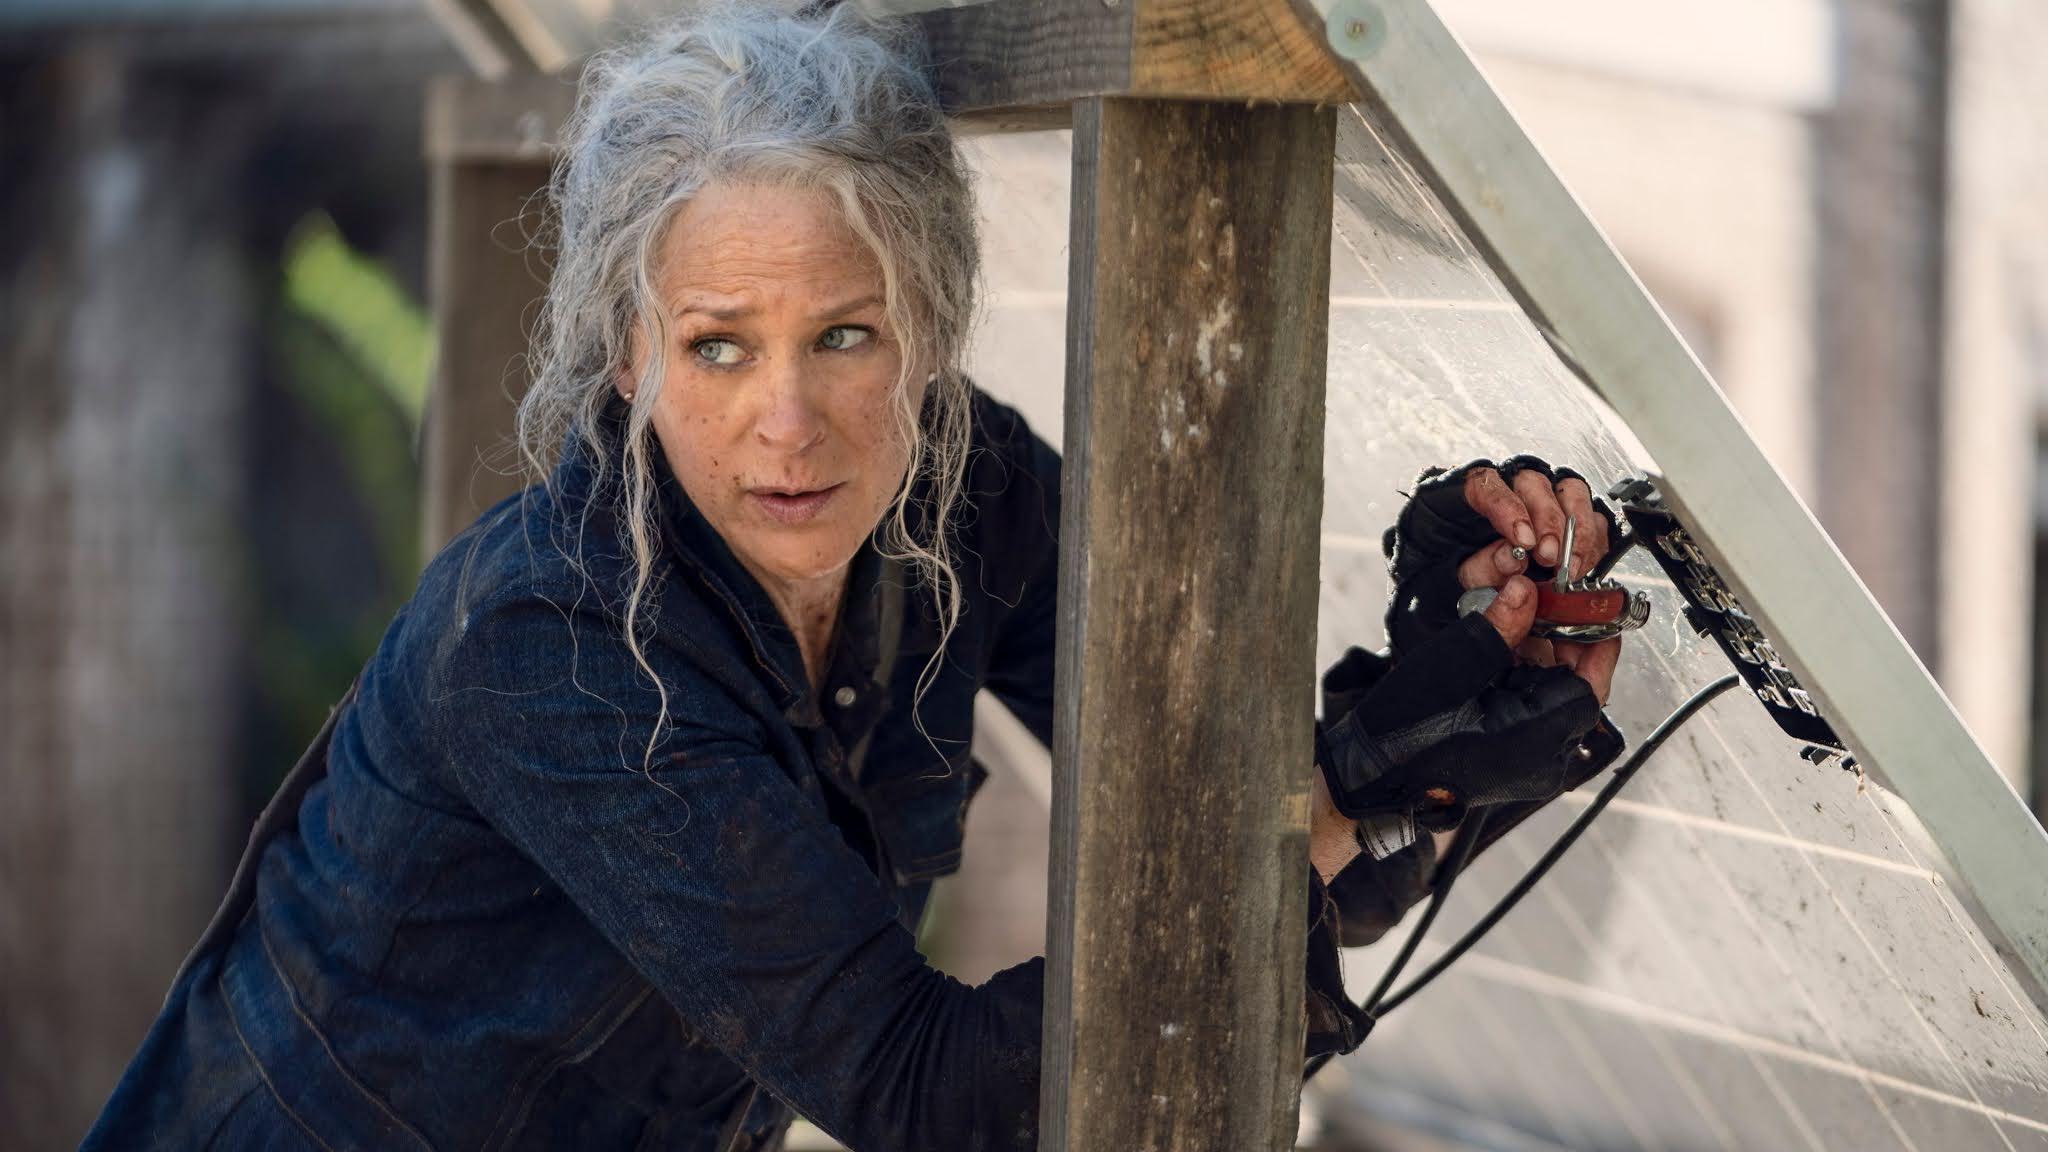 Carol arregla un panel solar en The Walking Dead